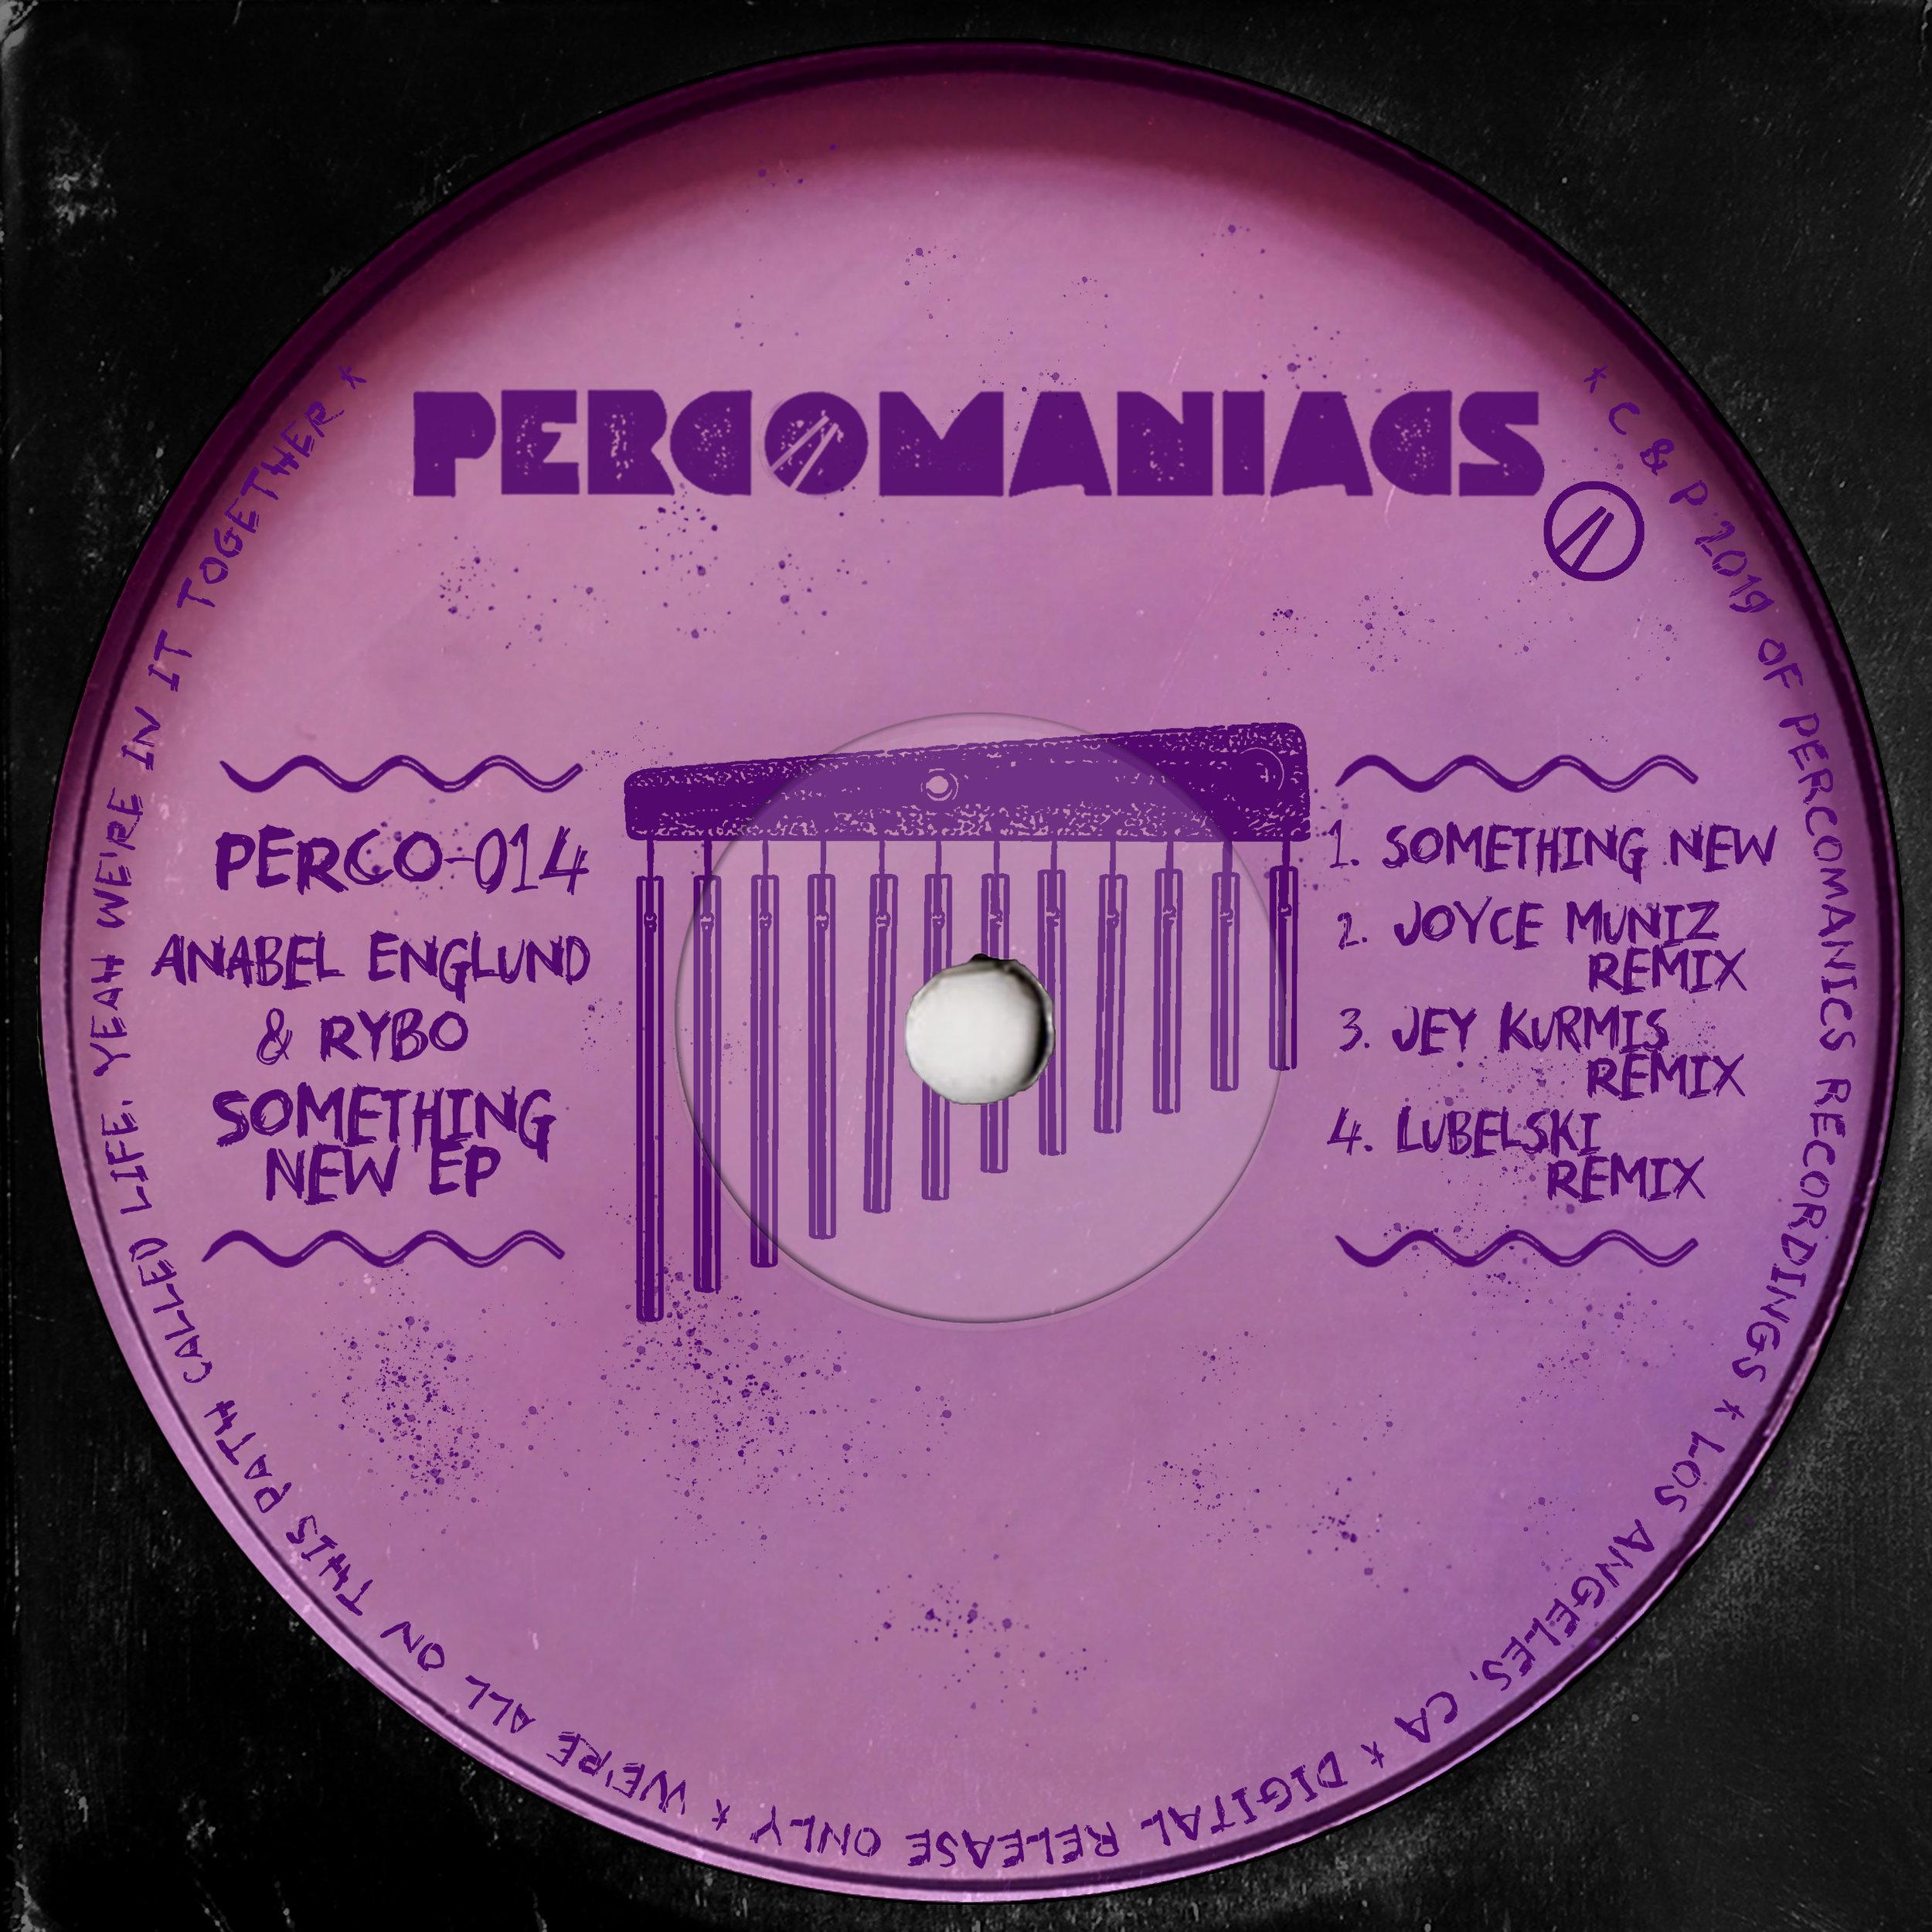 PERCO014 - ANABEL ENGLUND, RYBO - SOMETHING NEW EP